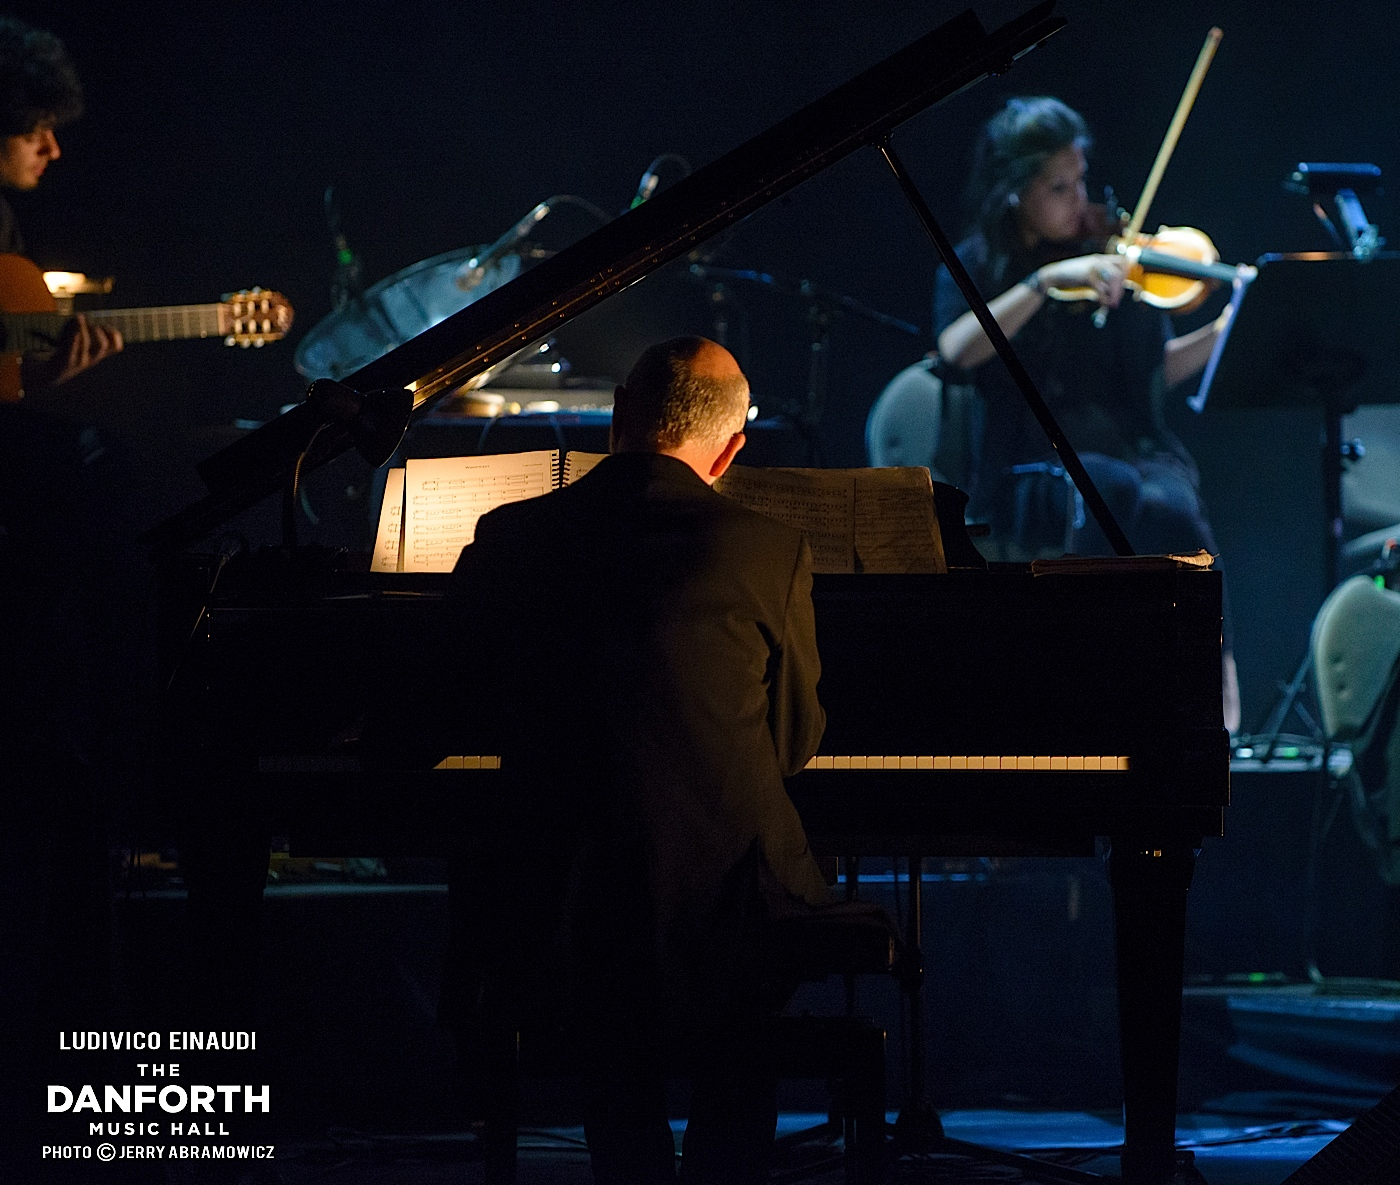 20130517 Ludivico Einaudi performs at The Danforth Music Hall Toronto 0114